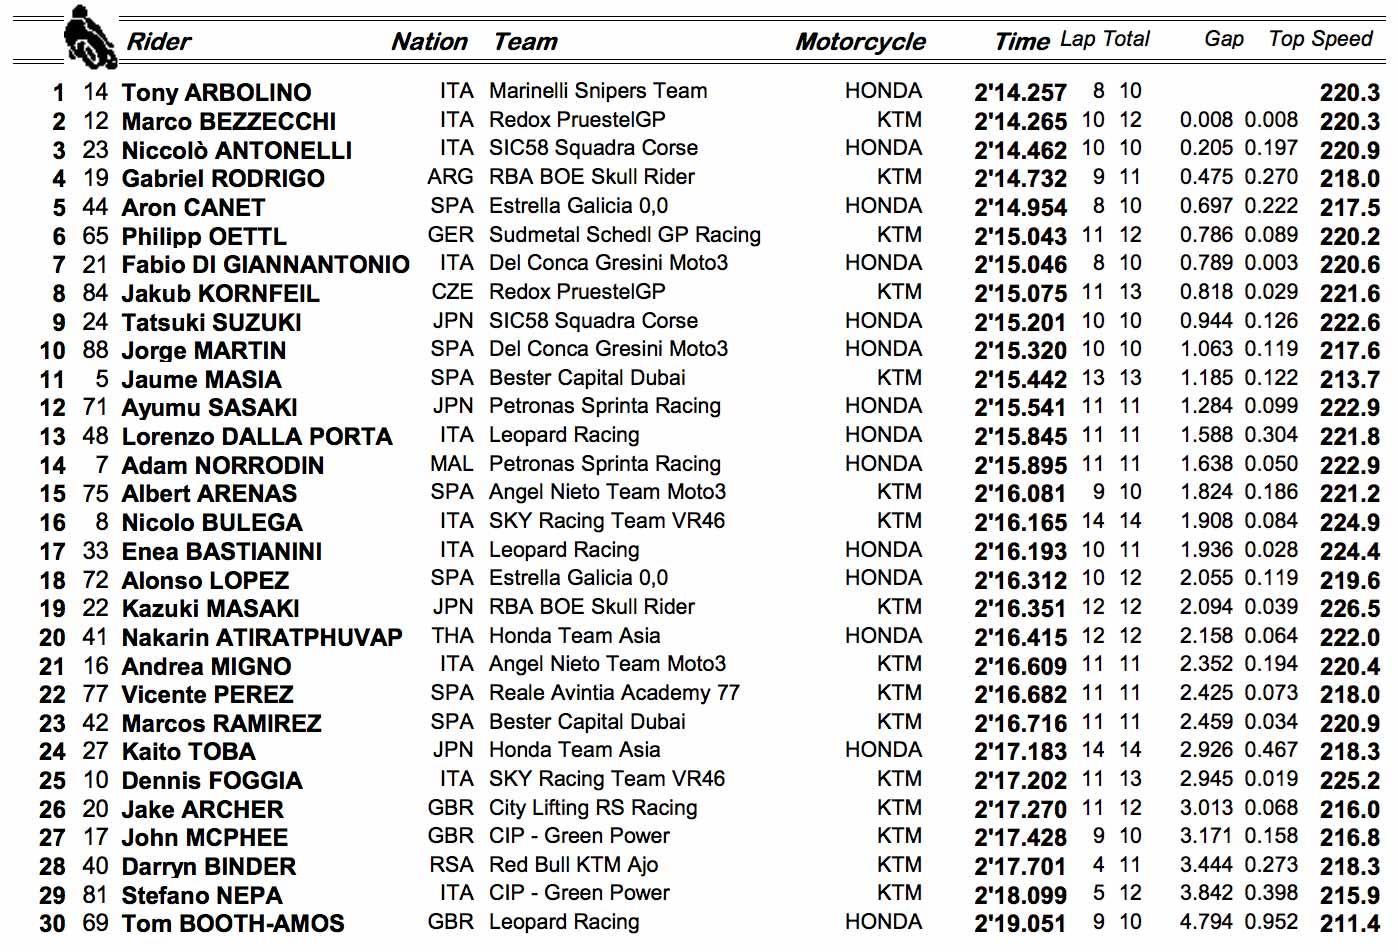 Moto3 FP2 times